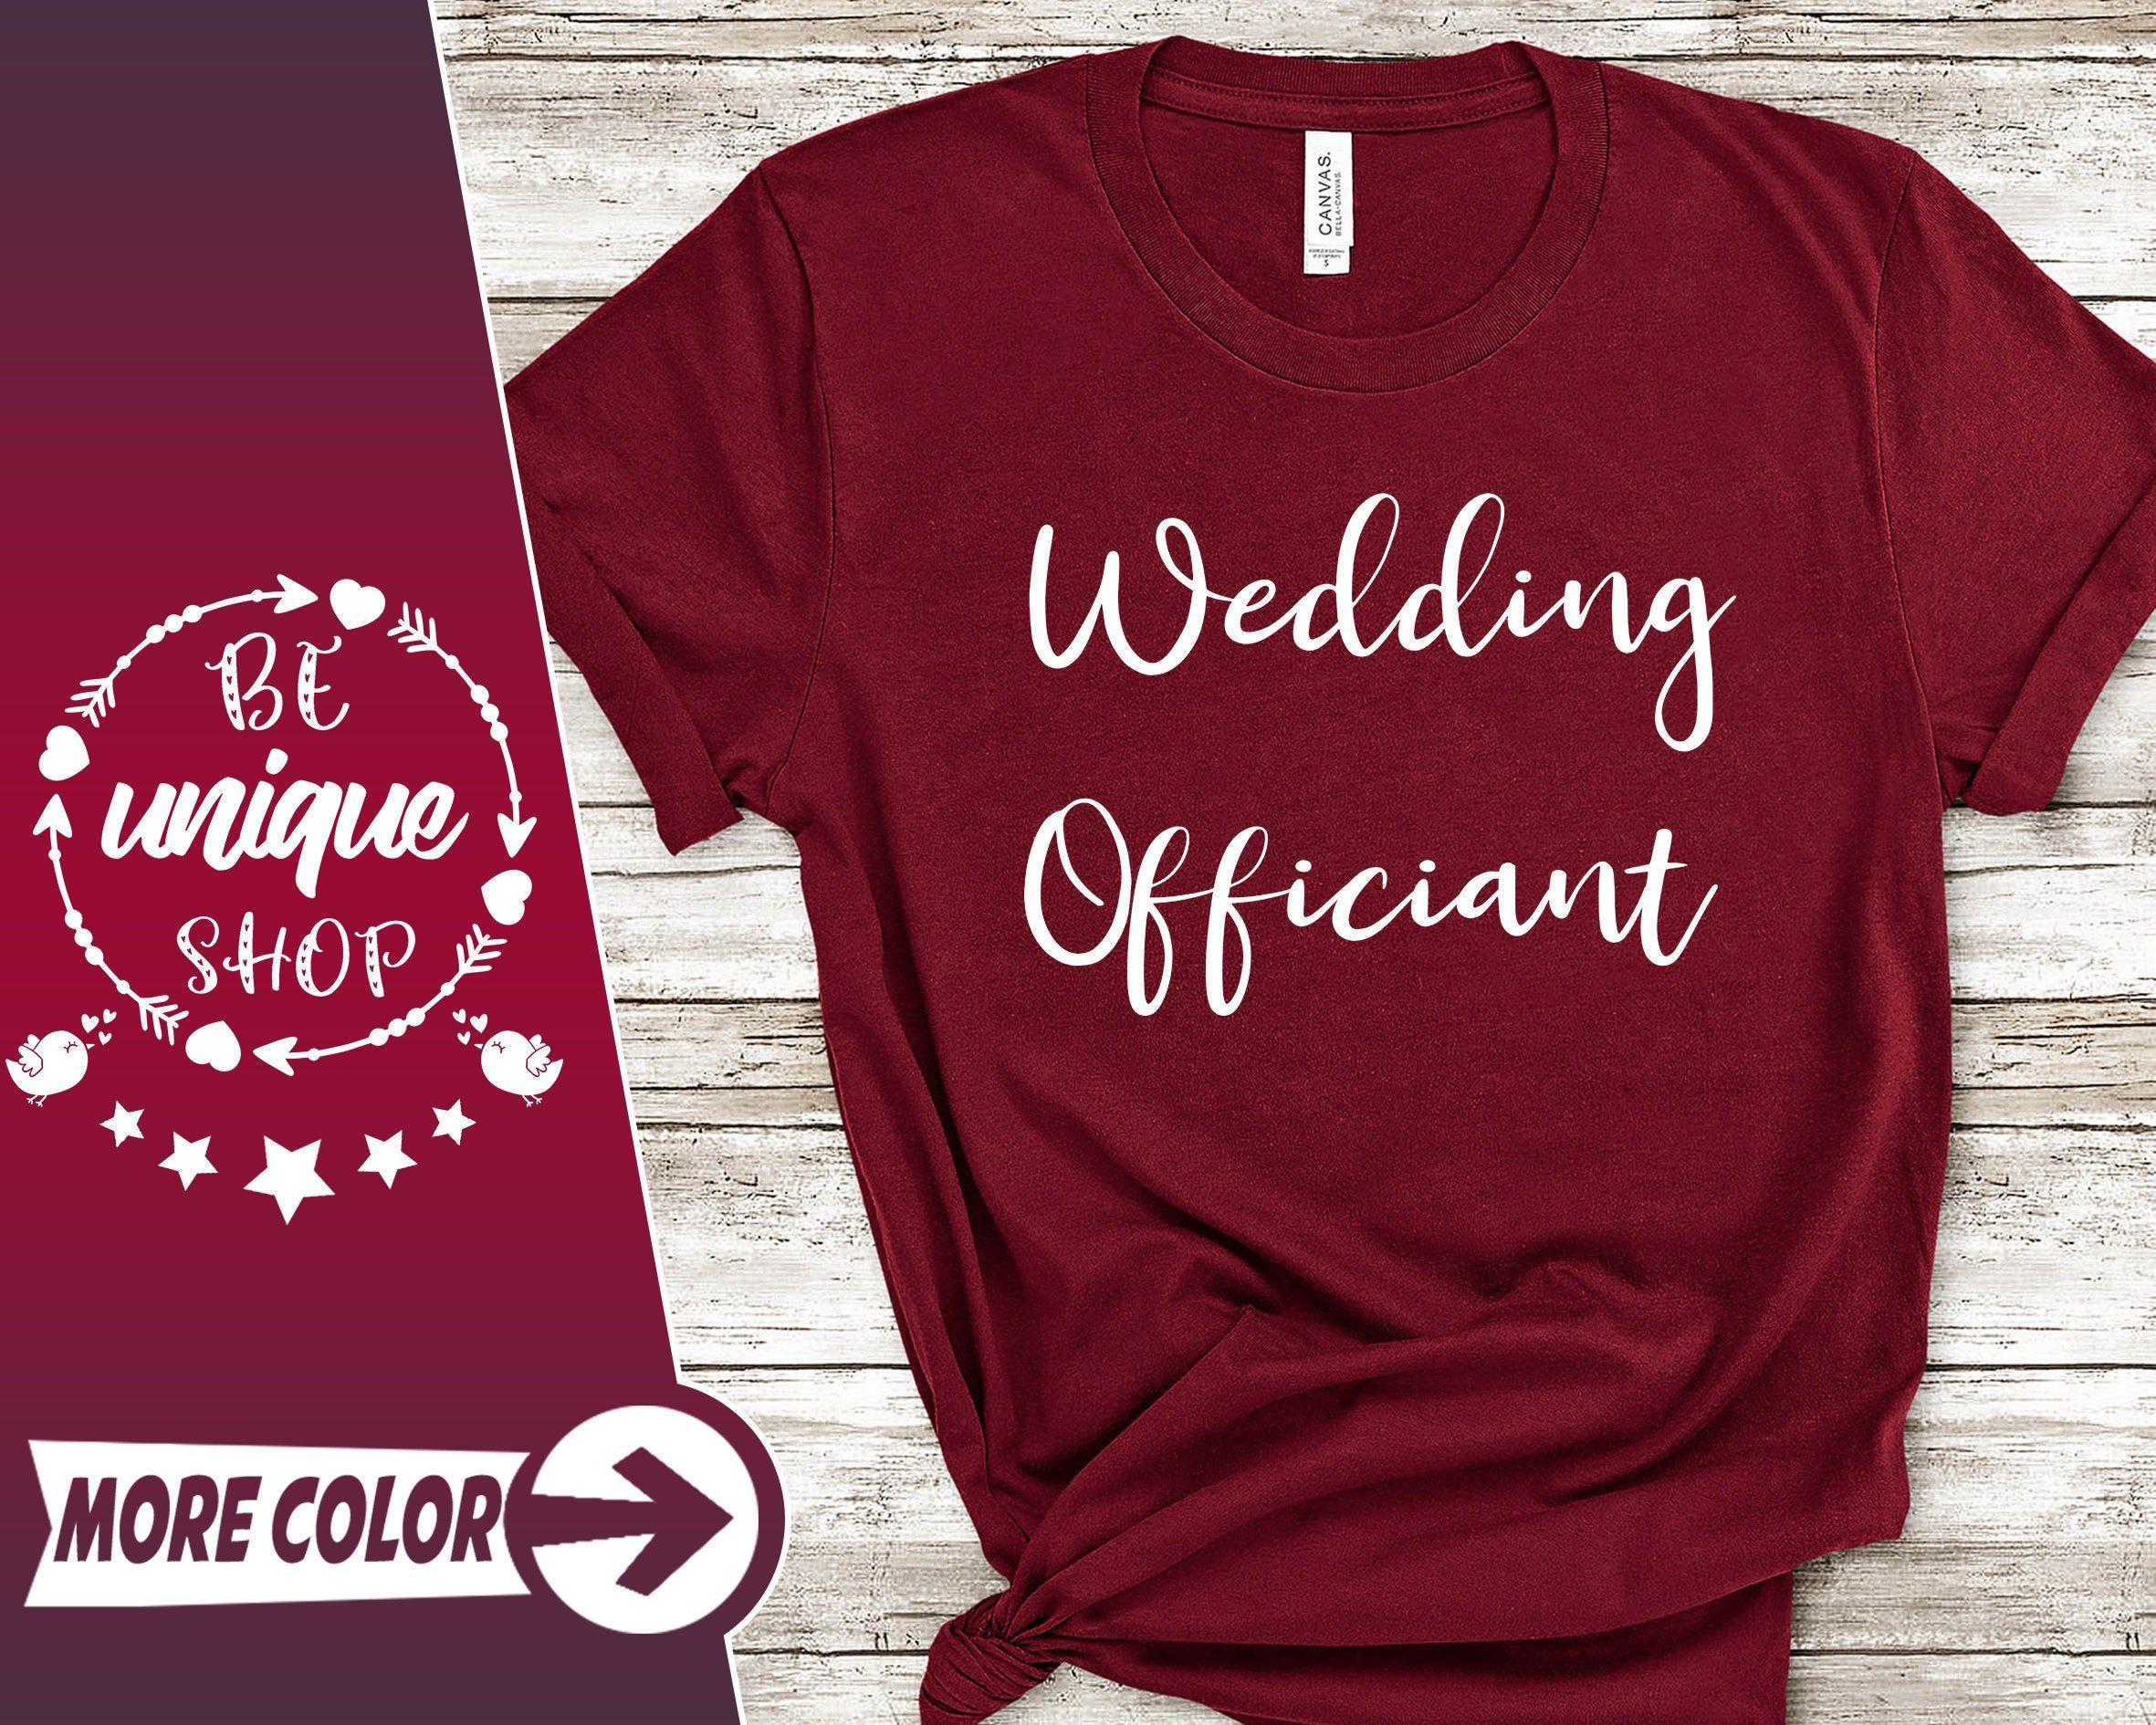 Wedding Officiant TShirt, Wedding Officiant Gift